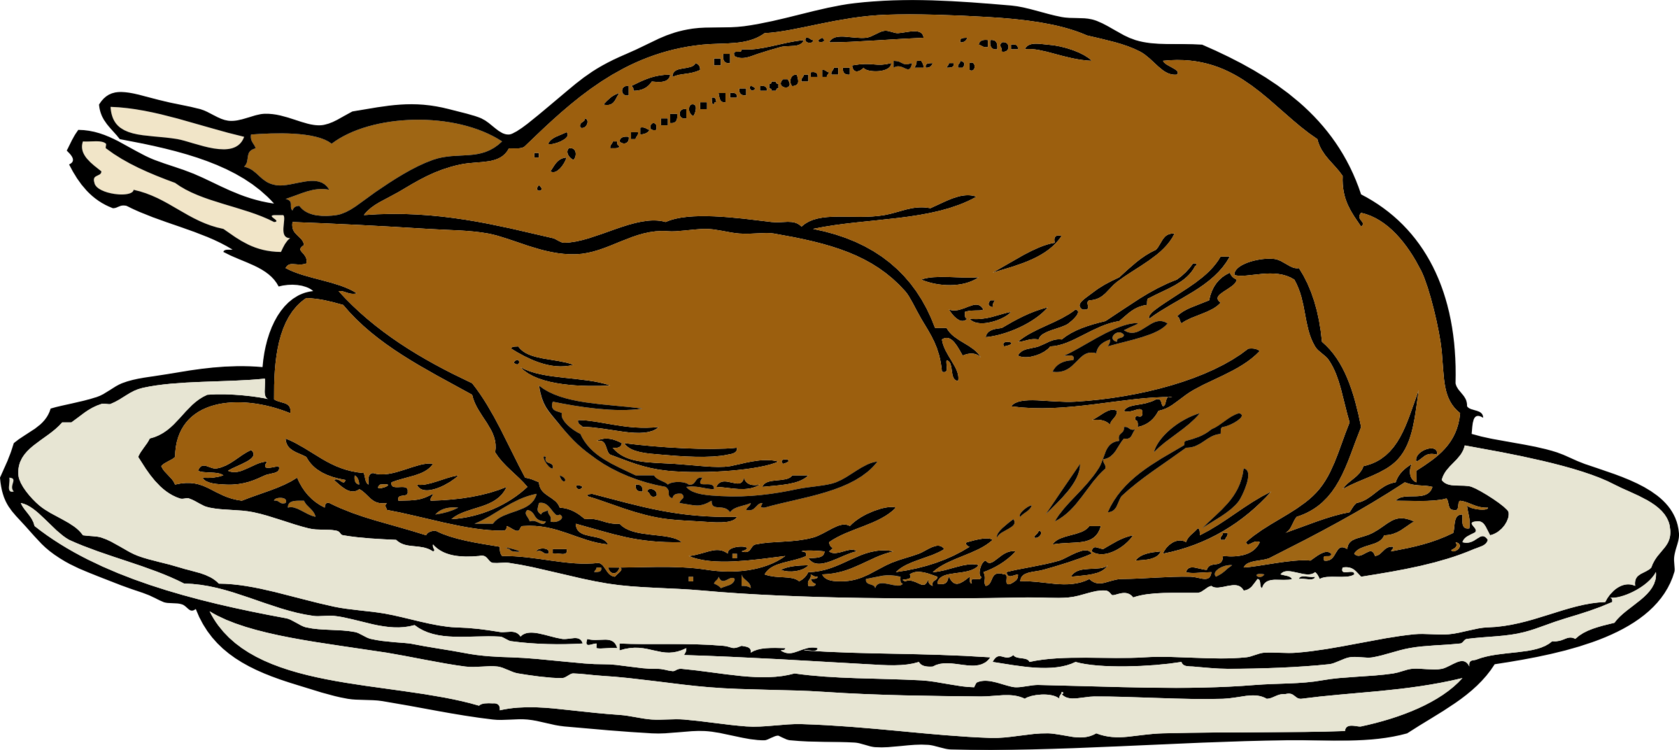 Food,Organism,Cat Like Mammal